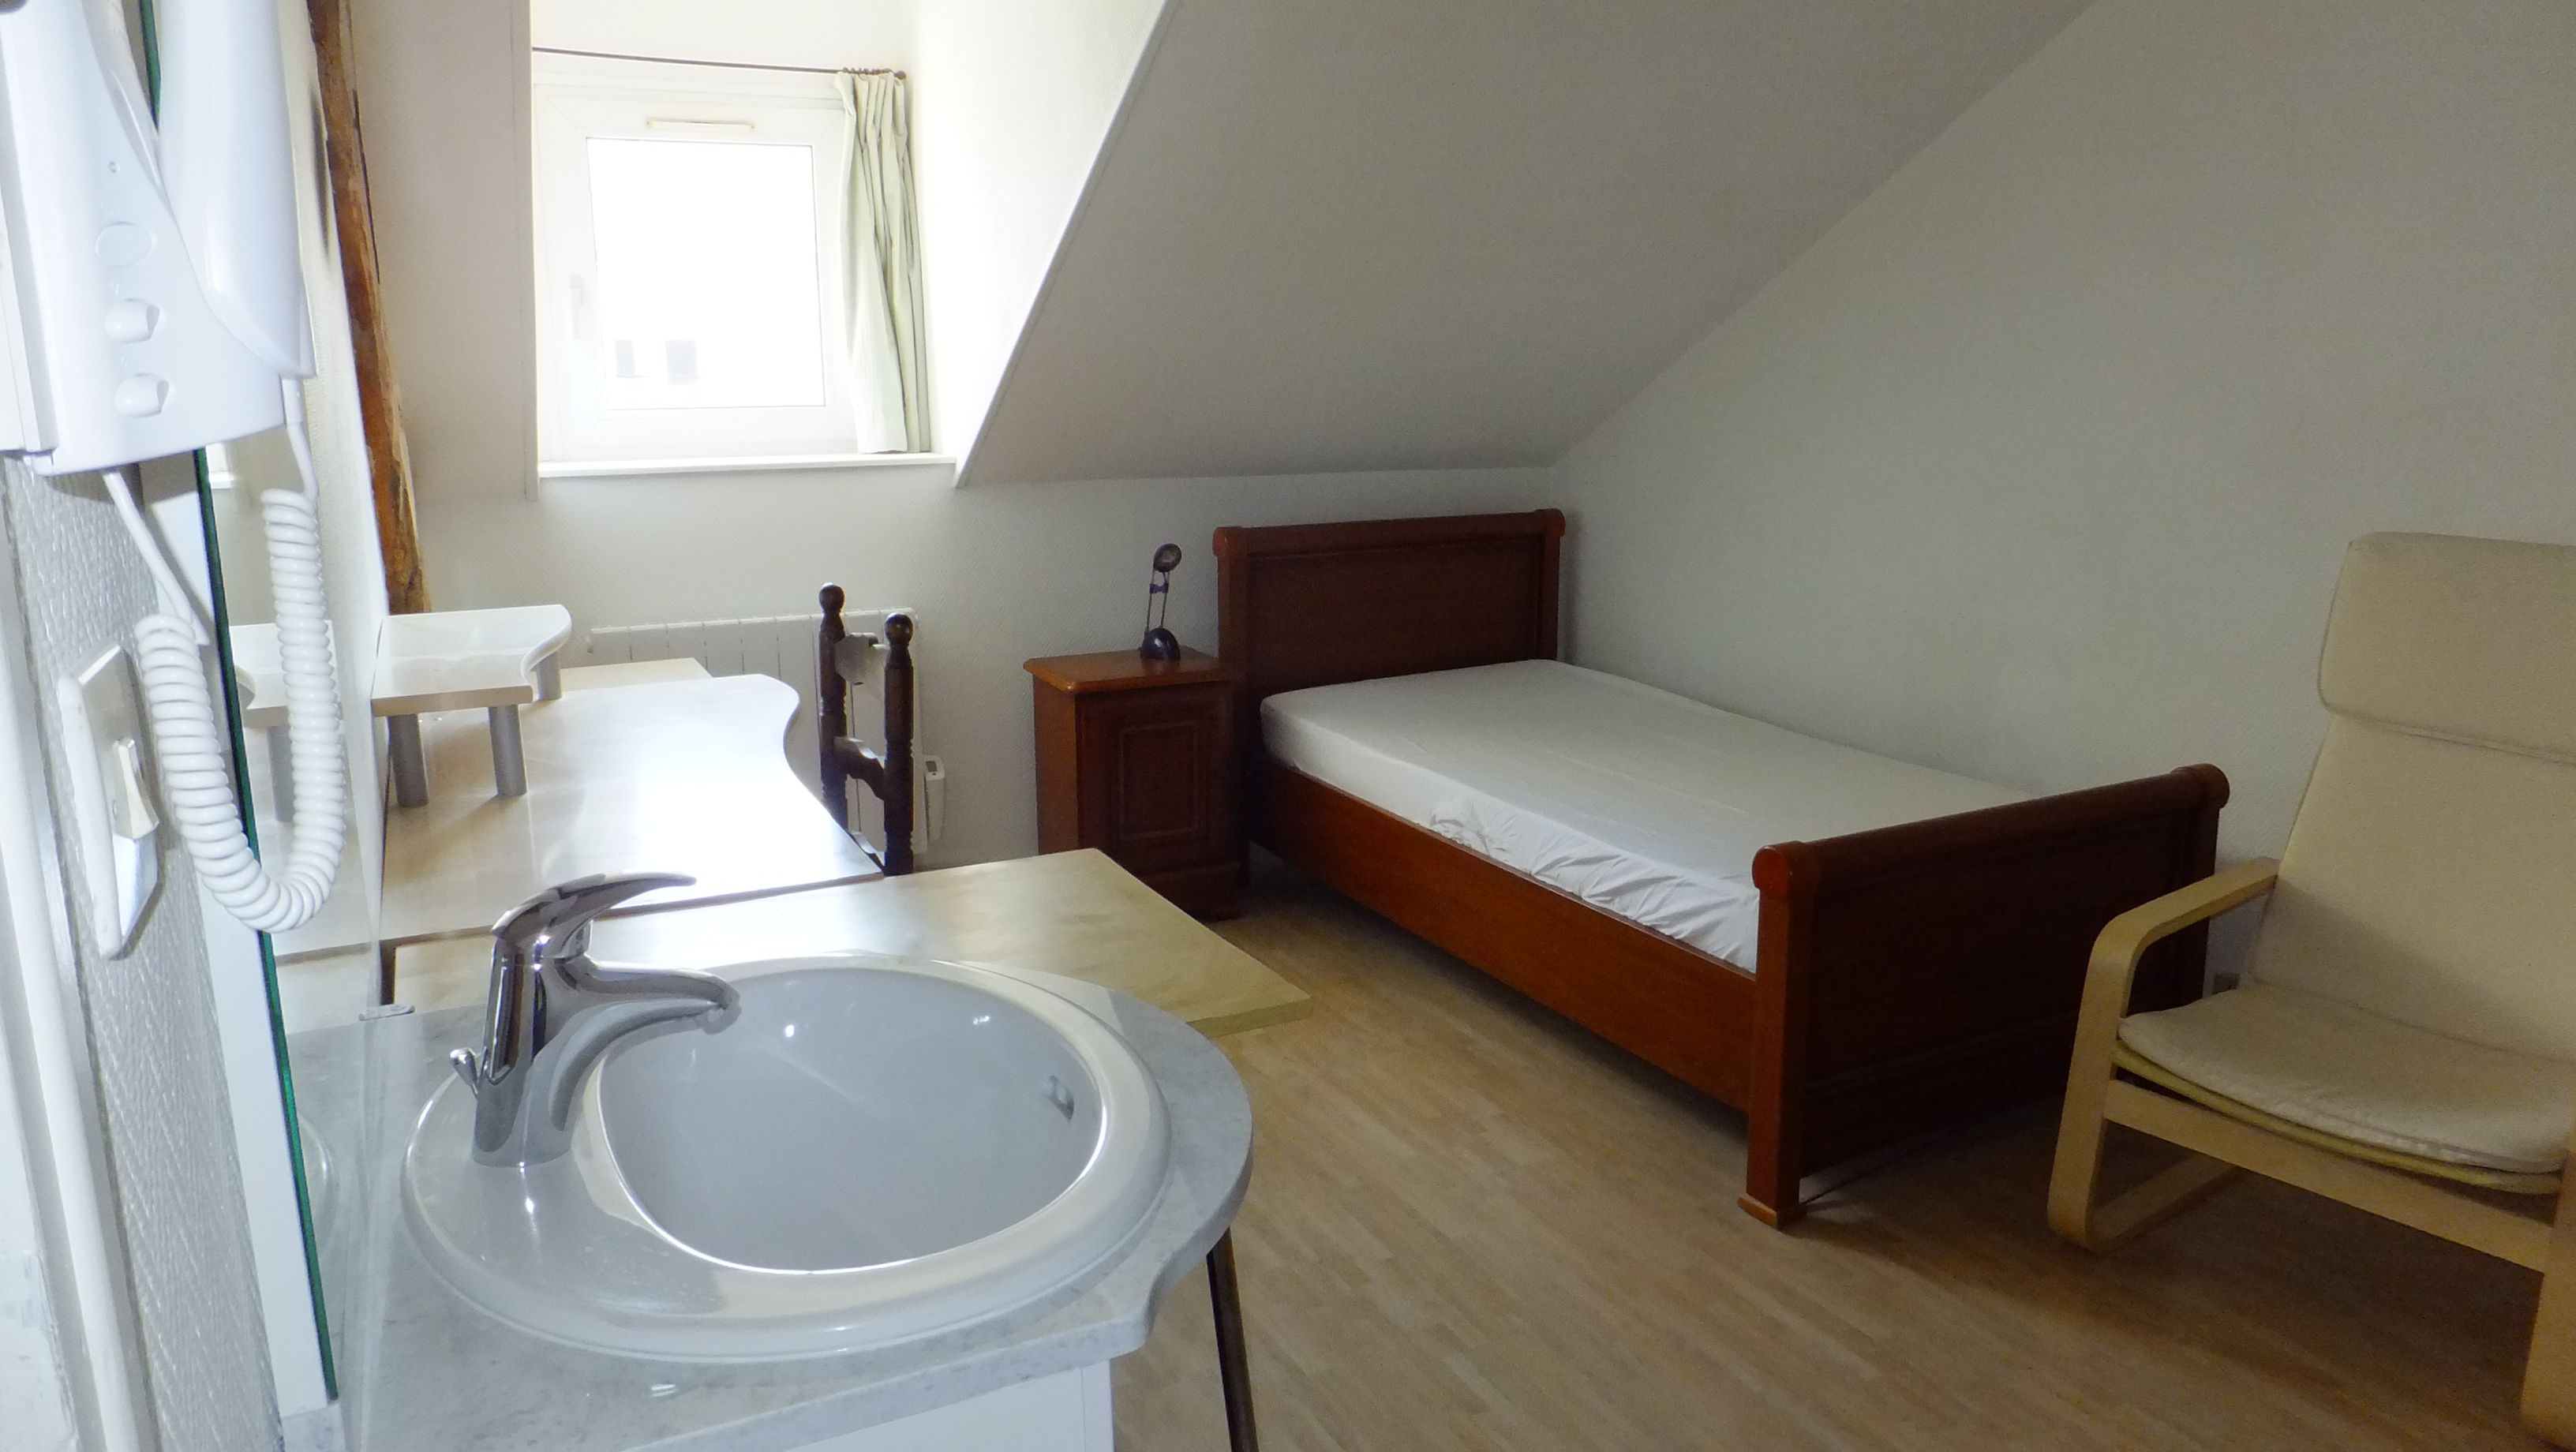 location tudiant chambre meubl e proche catho esa bx arts mongazon. Black Bedroom Furniture Sets. Home Design Ideas